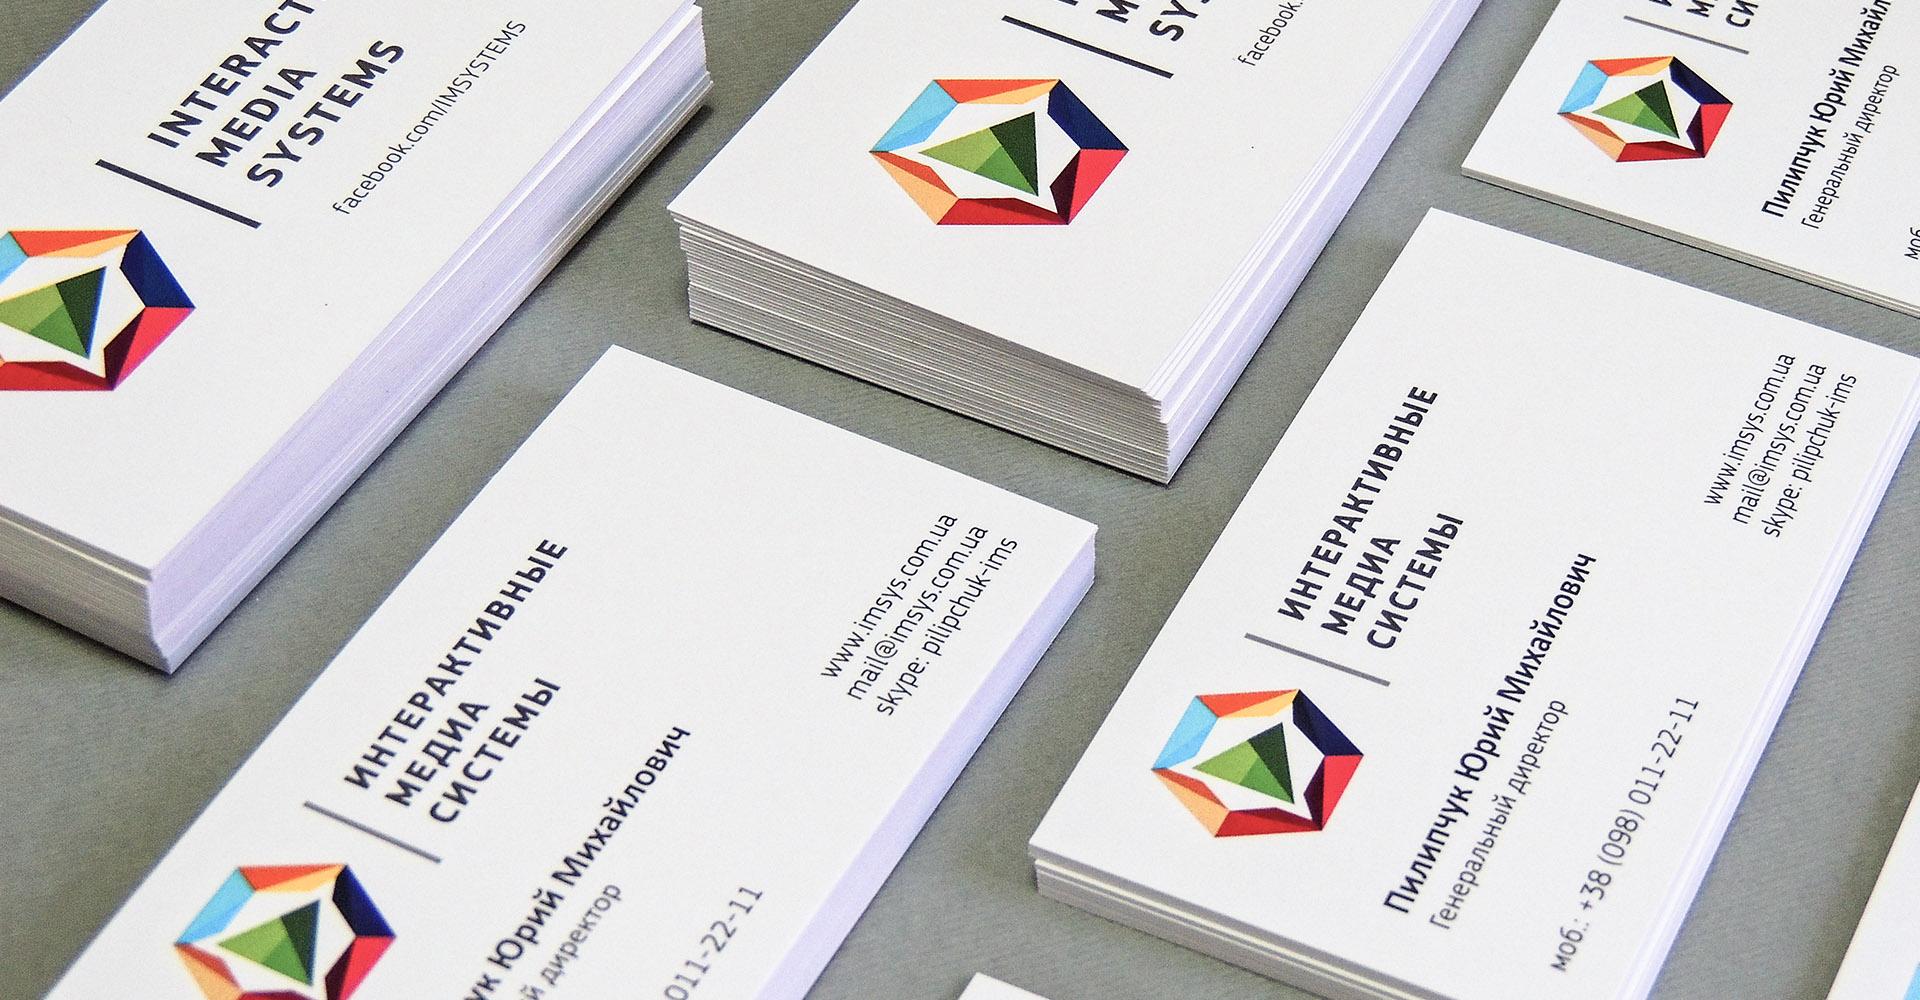 Дизайн визиток IT компании, IT company business cards design